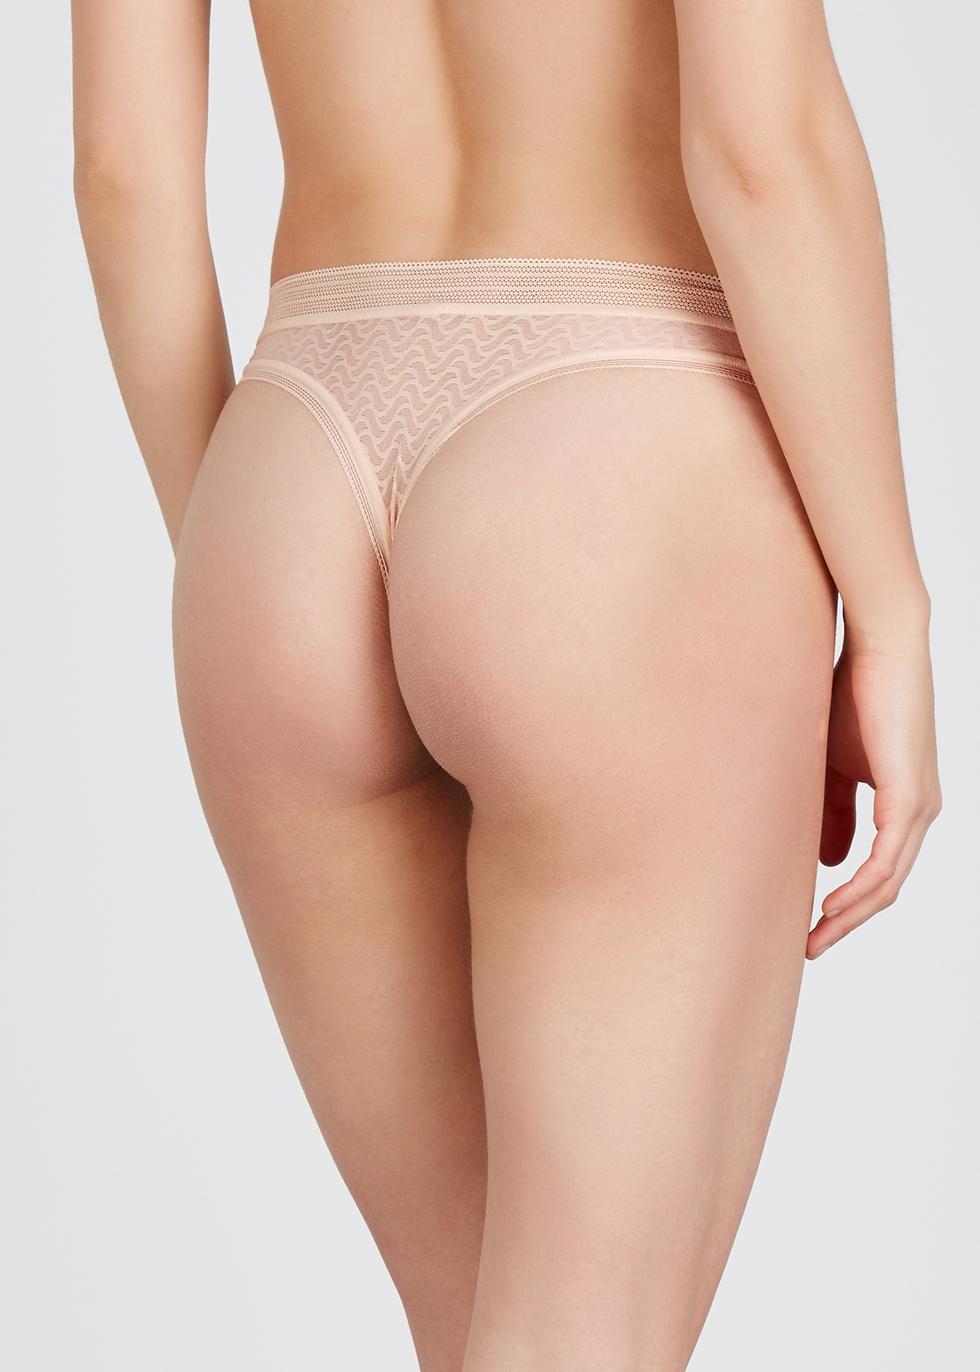 Aphrodite blush lace thong - Wacoal